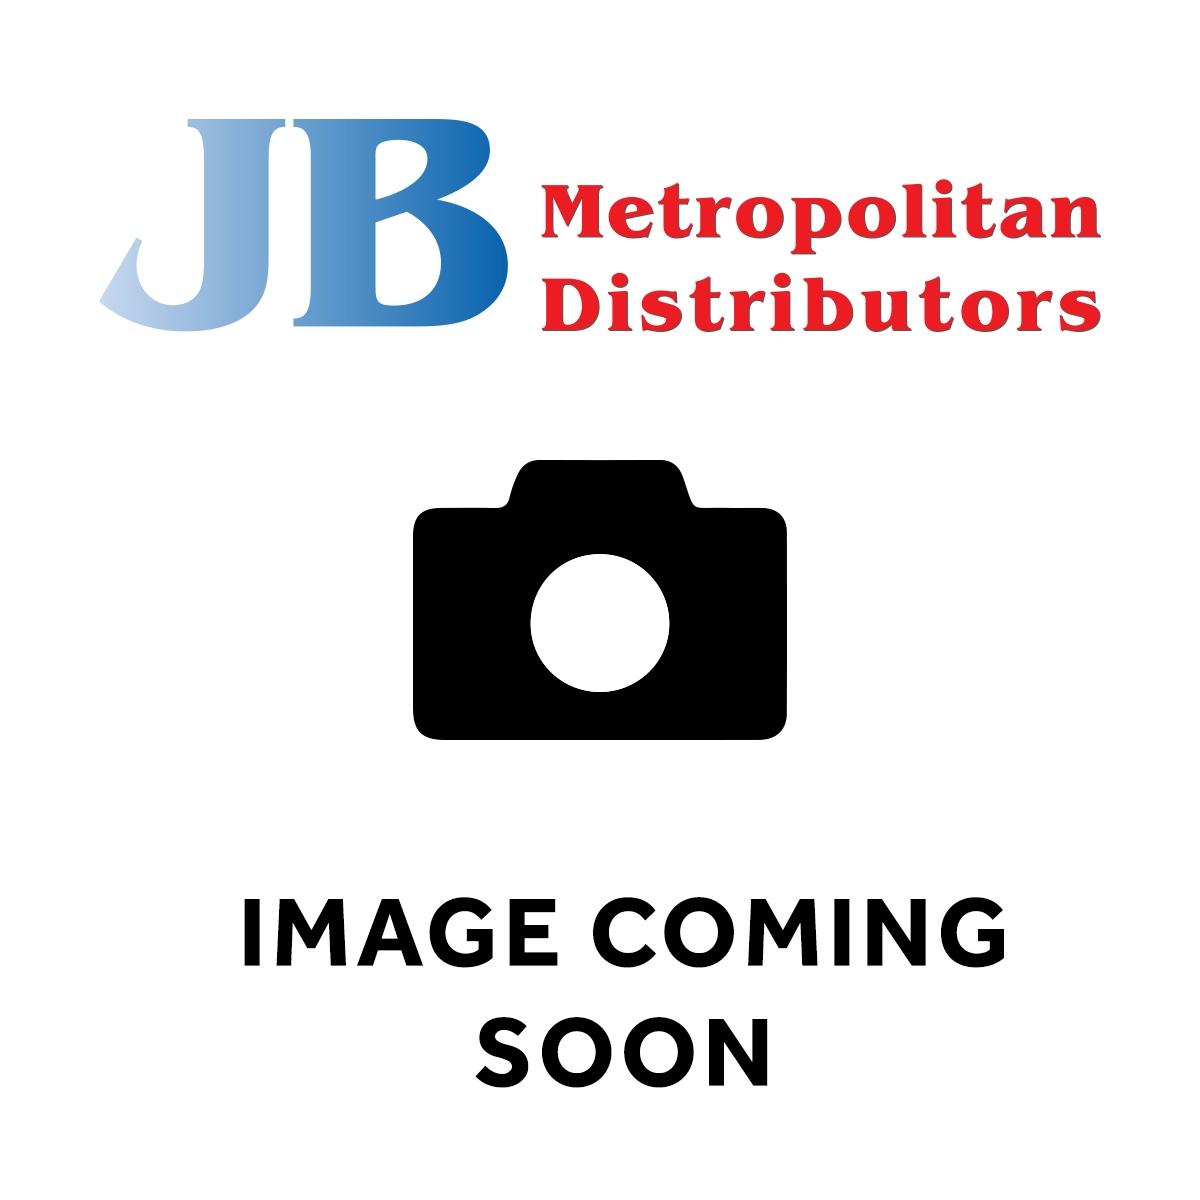 170G NESTLE JAFFAS BLOCK